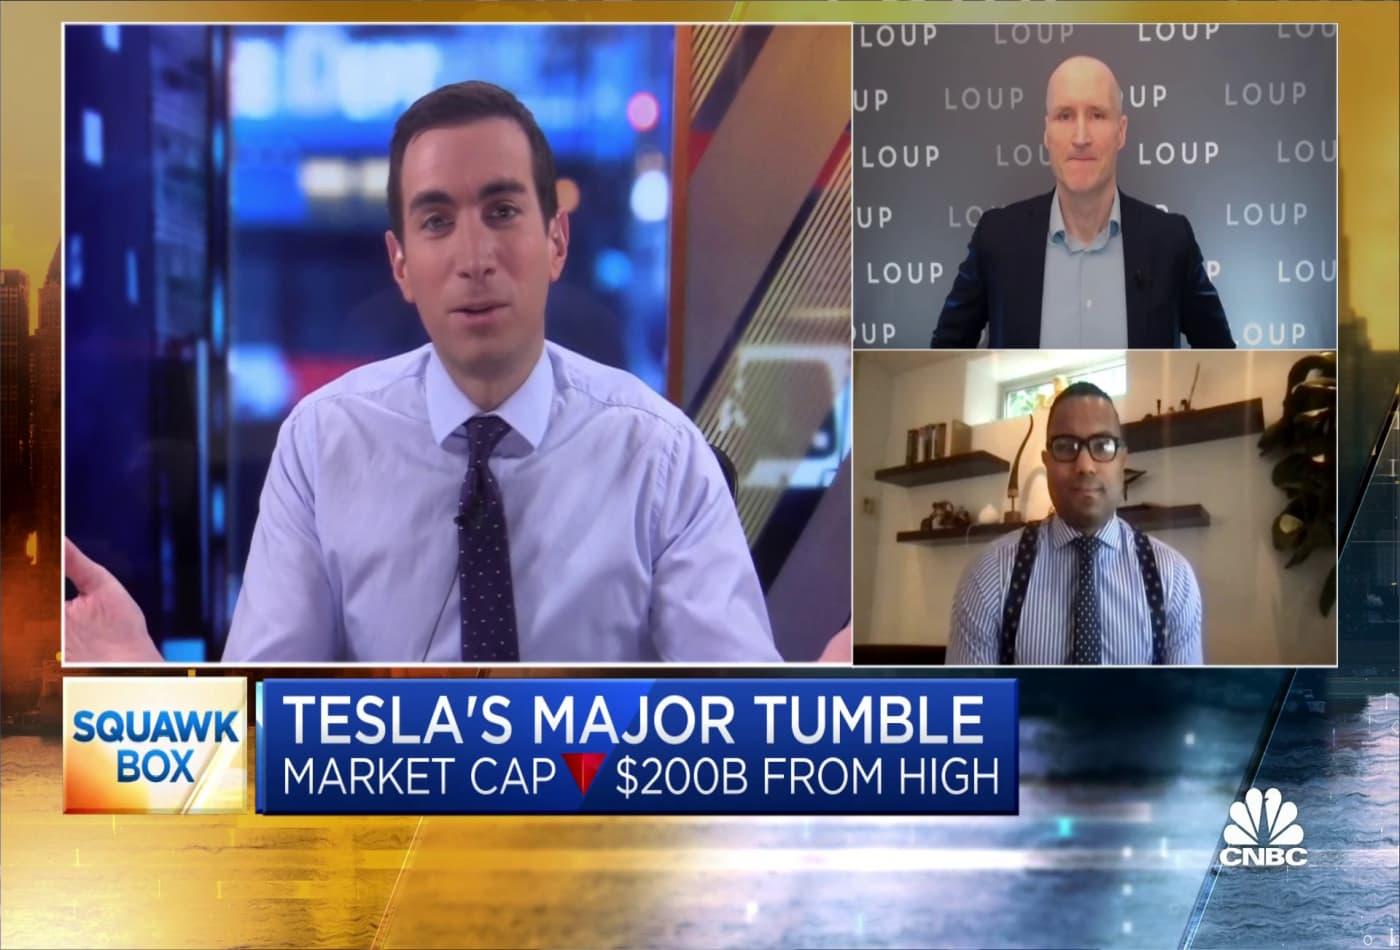 Tesla bull and bear debate the stock's major tumble